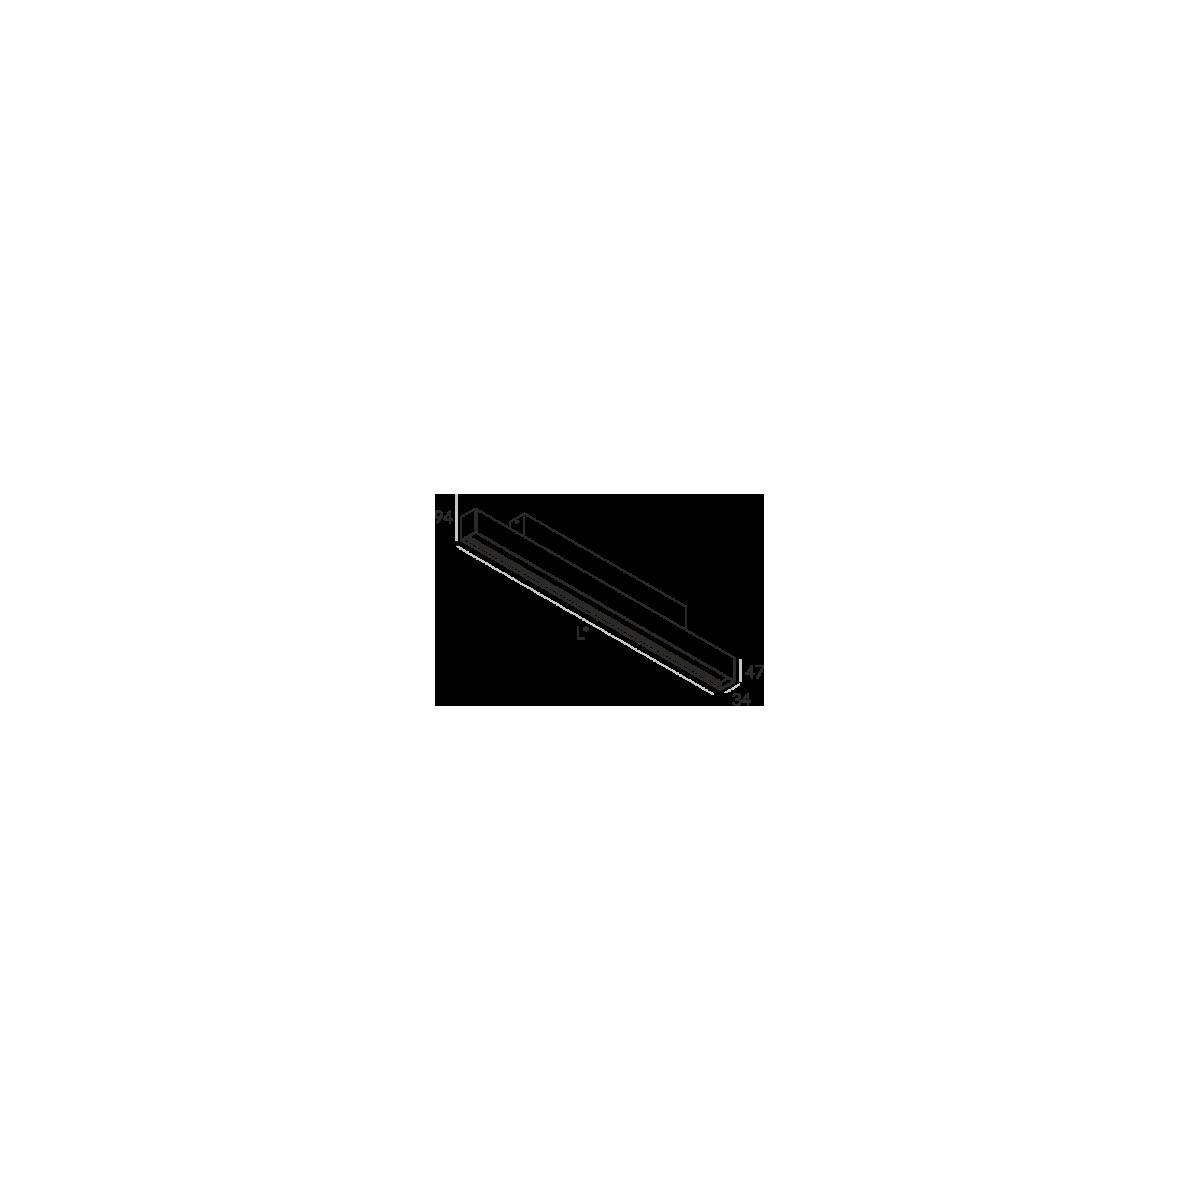 Labra RAY NT.1694mm 38W 6-0620 Sufitowa